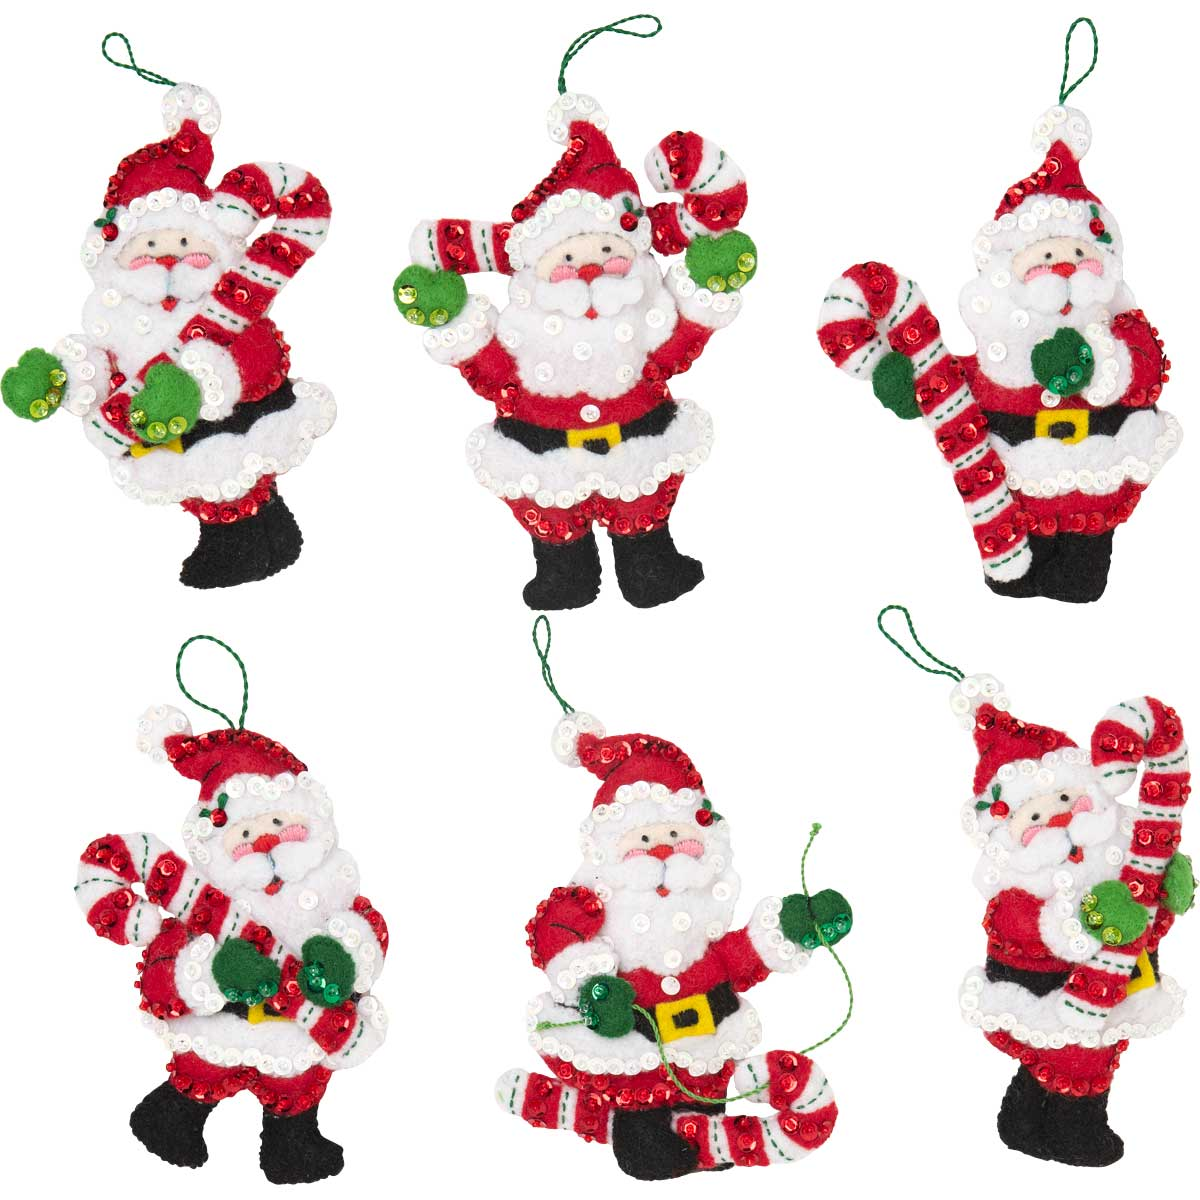 Bucilla ® Seasonal - Felt - Ornament Kits - Candy Cane Santas